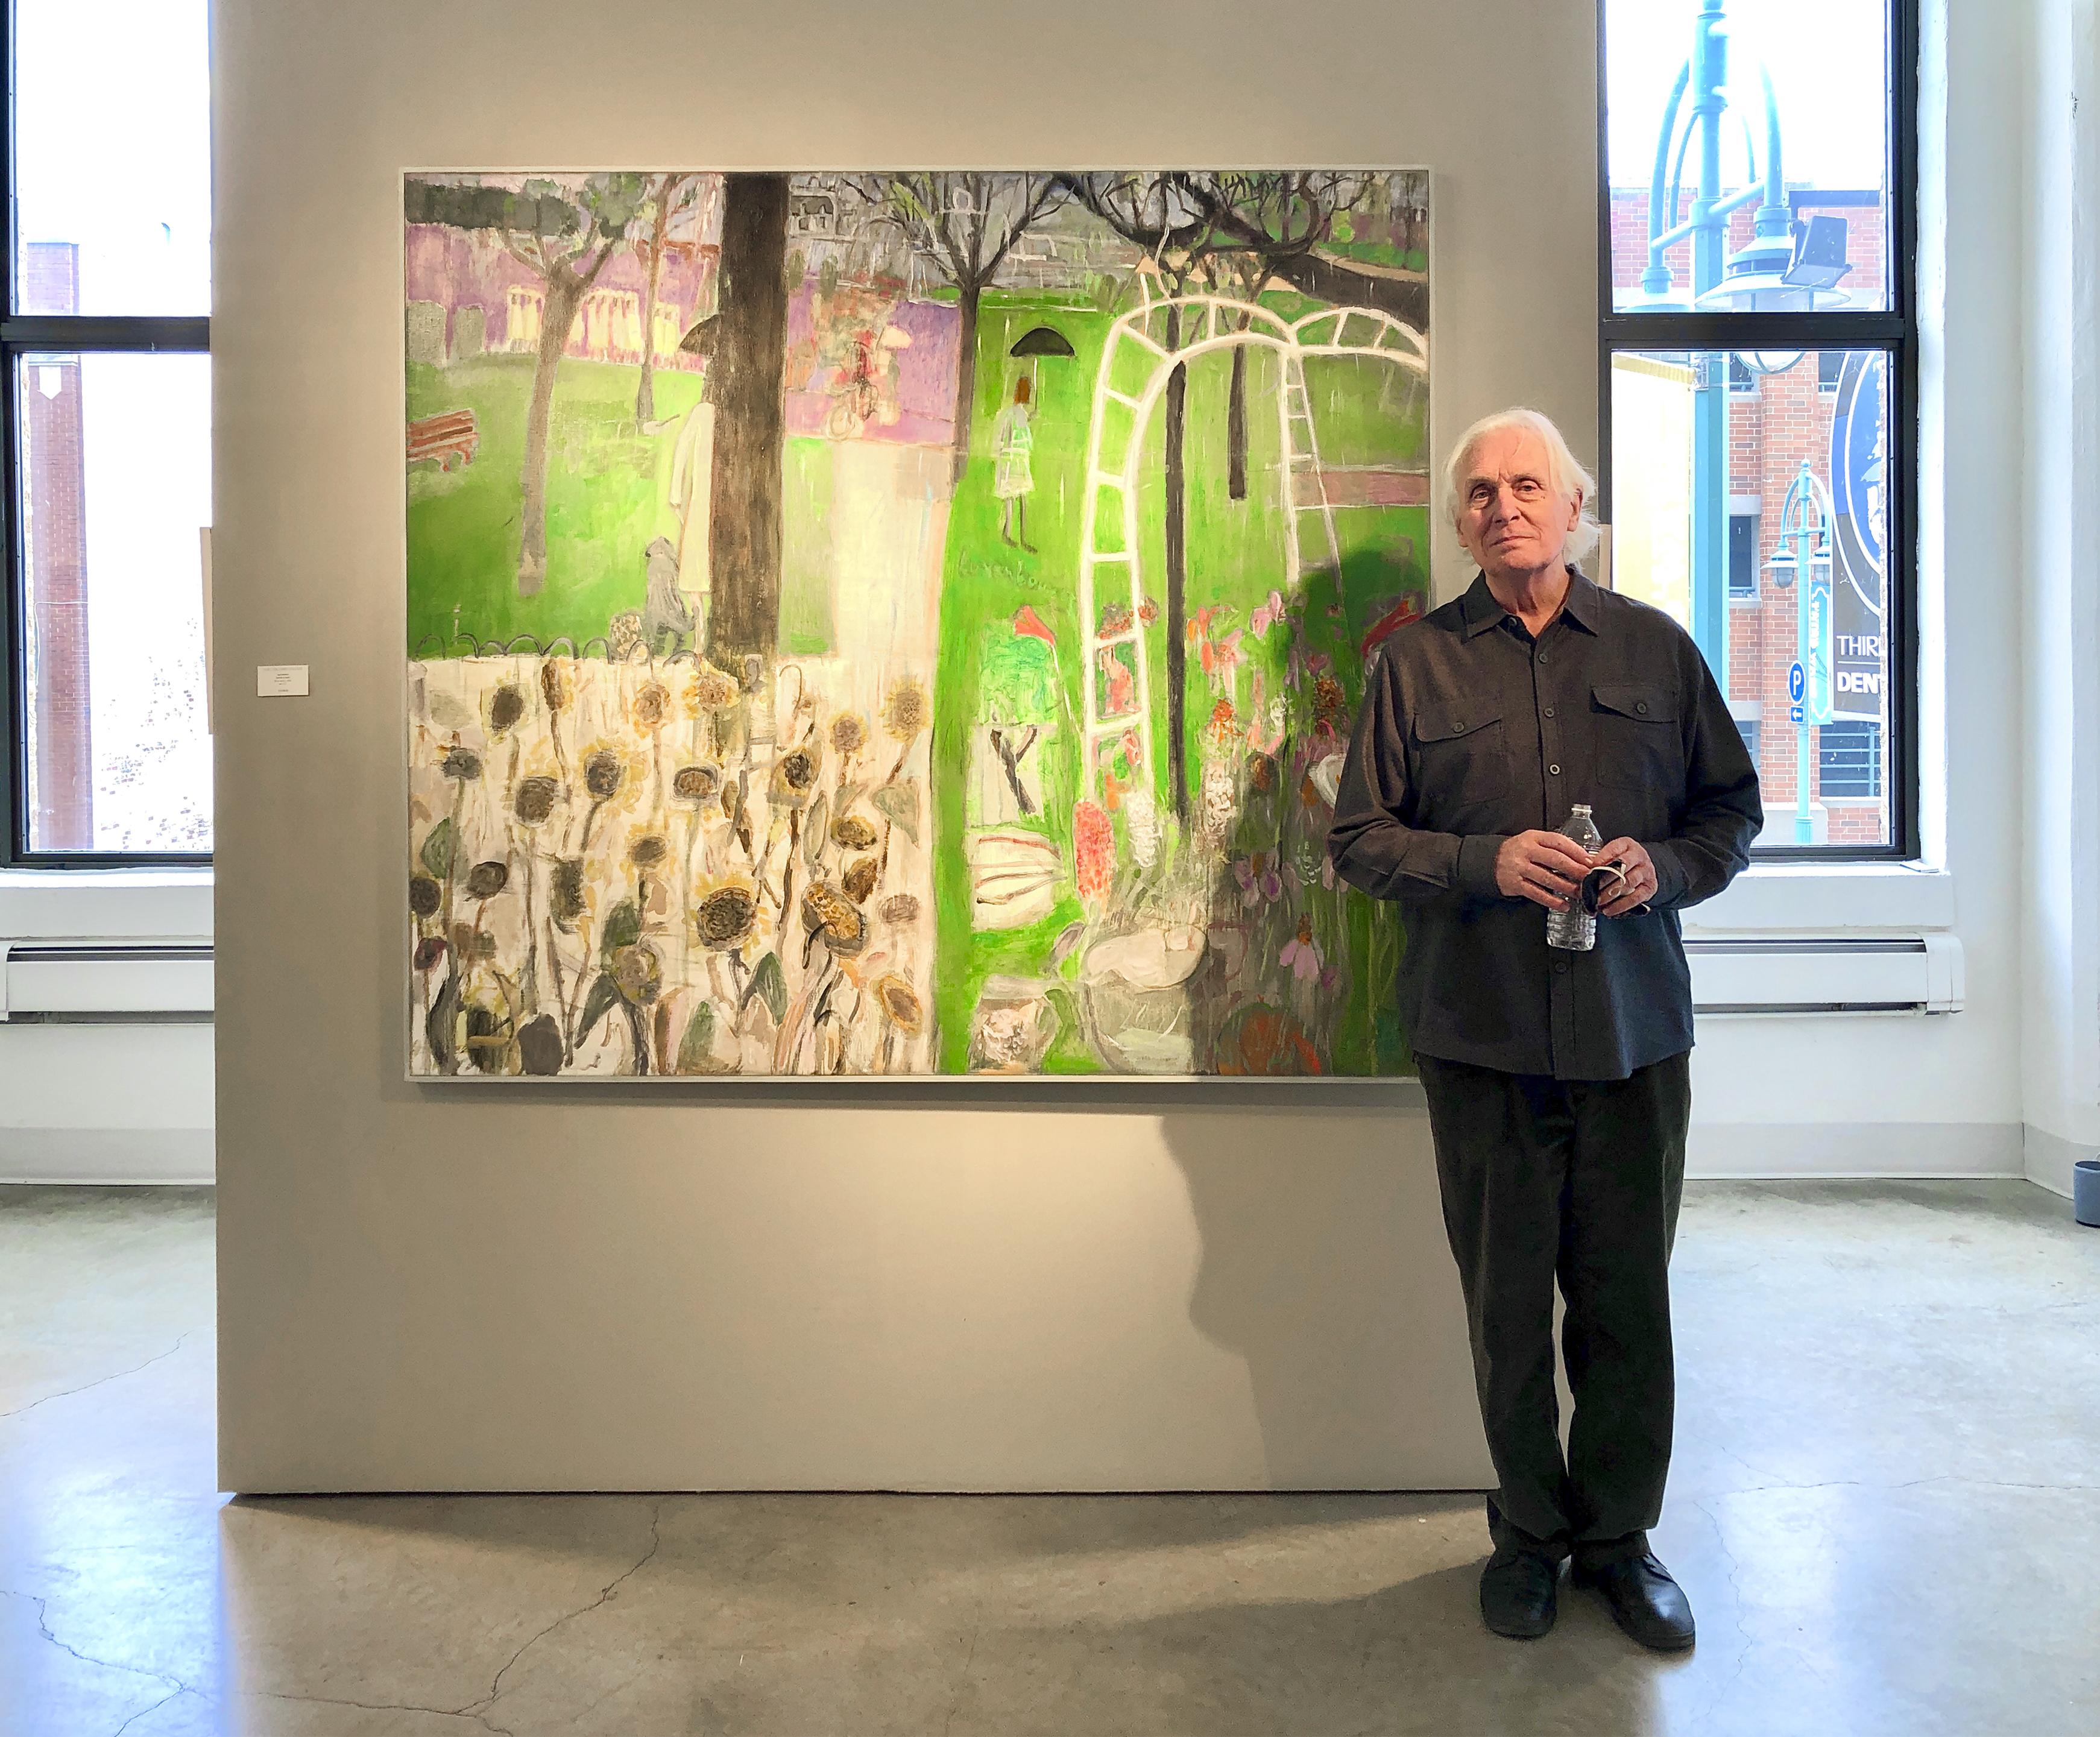 Mark Mulhern. Photo courtesy of Tory Folliard Gallery.